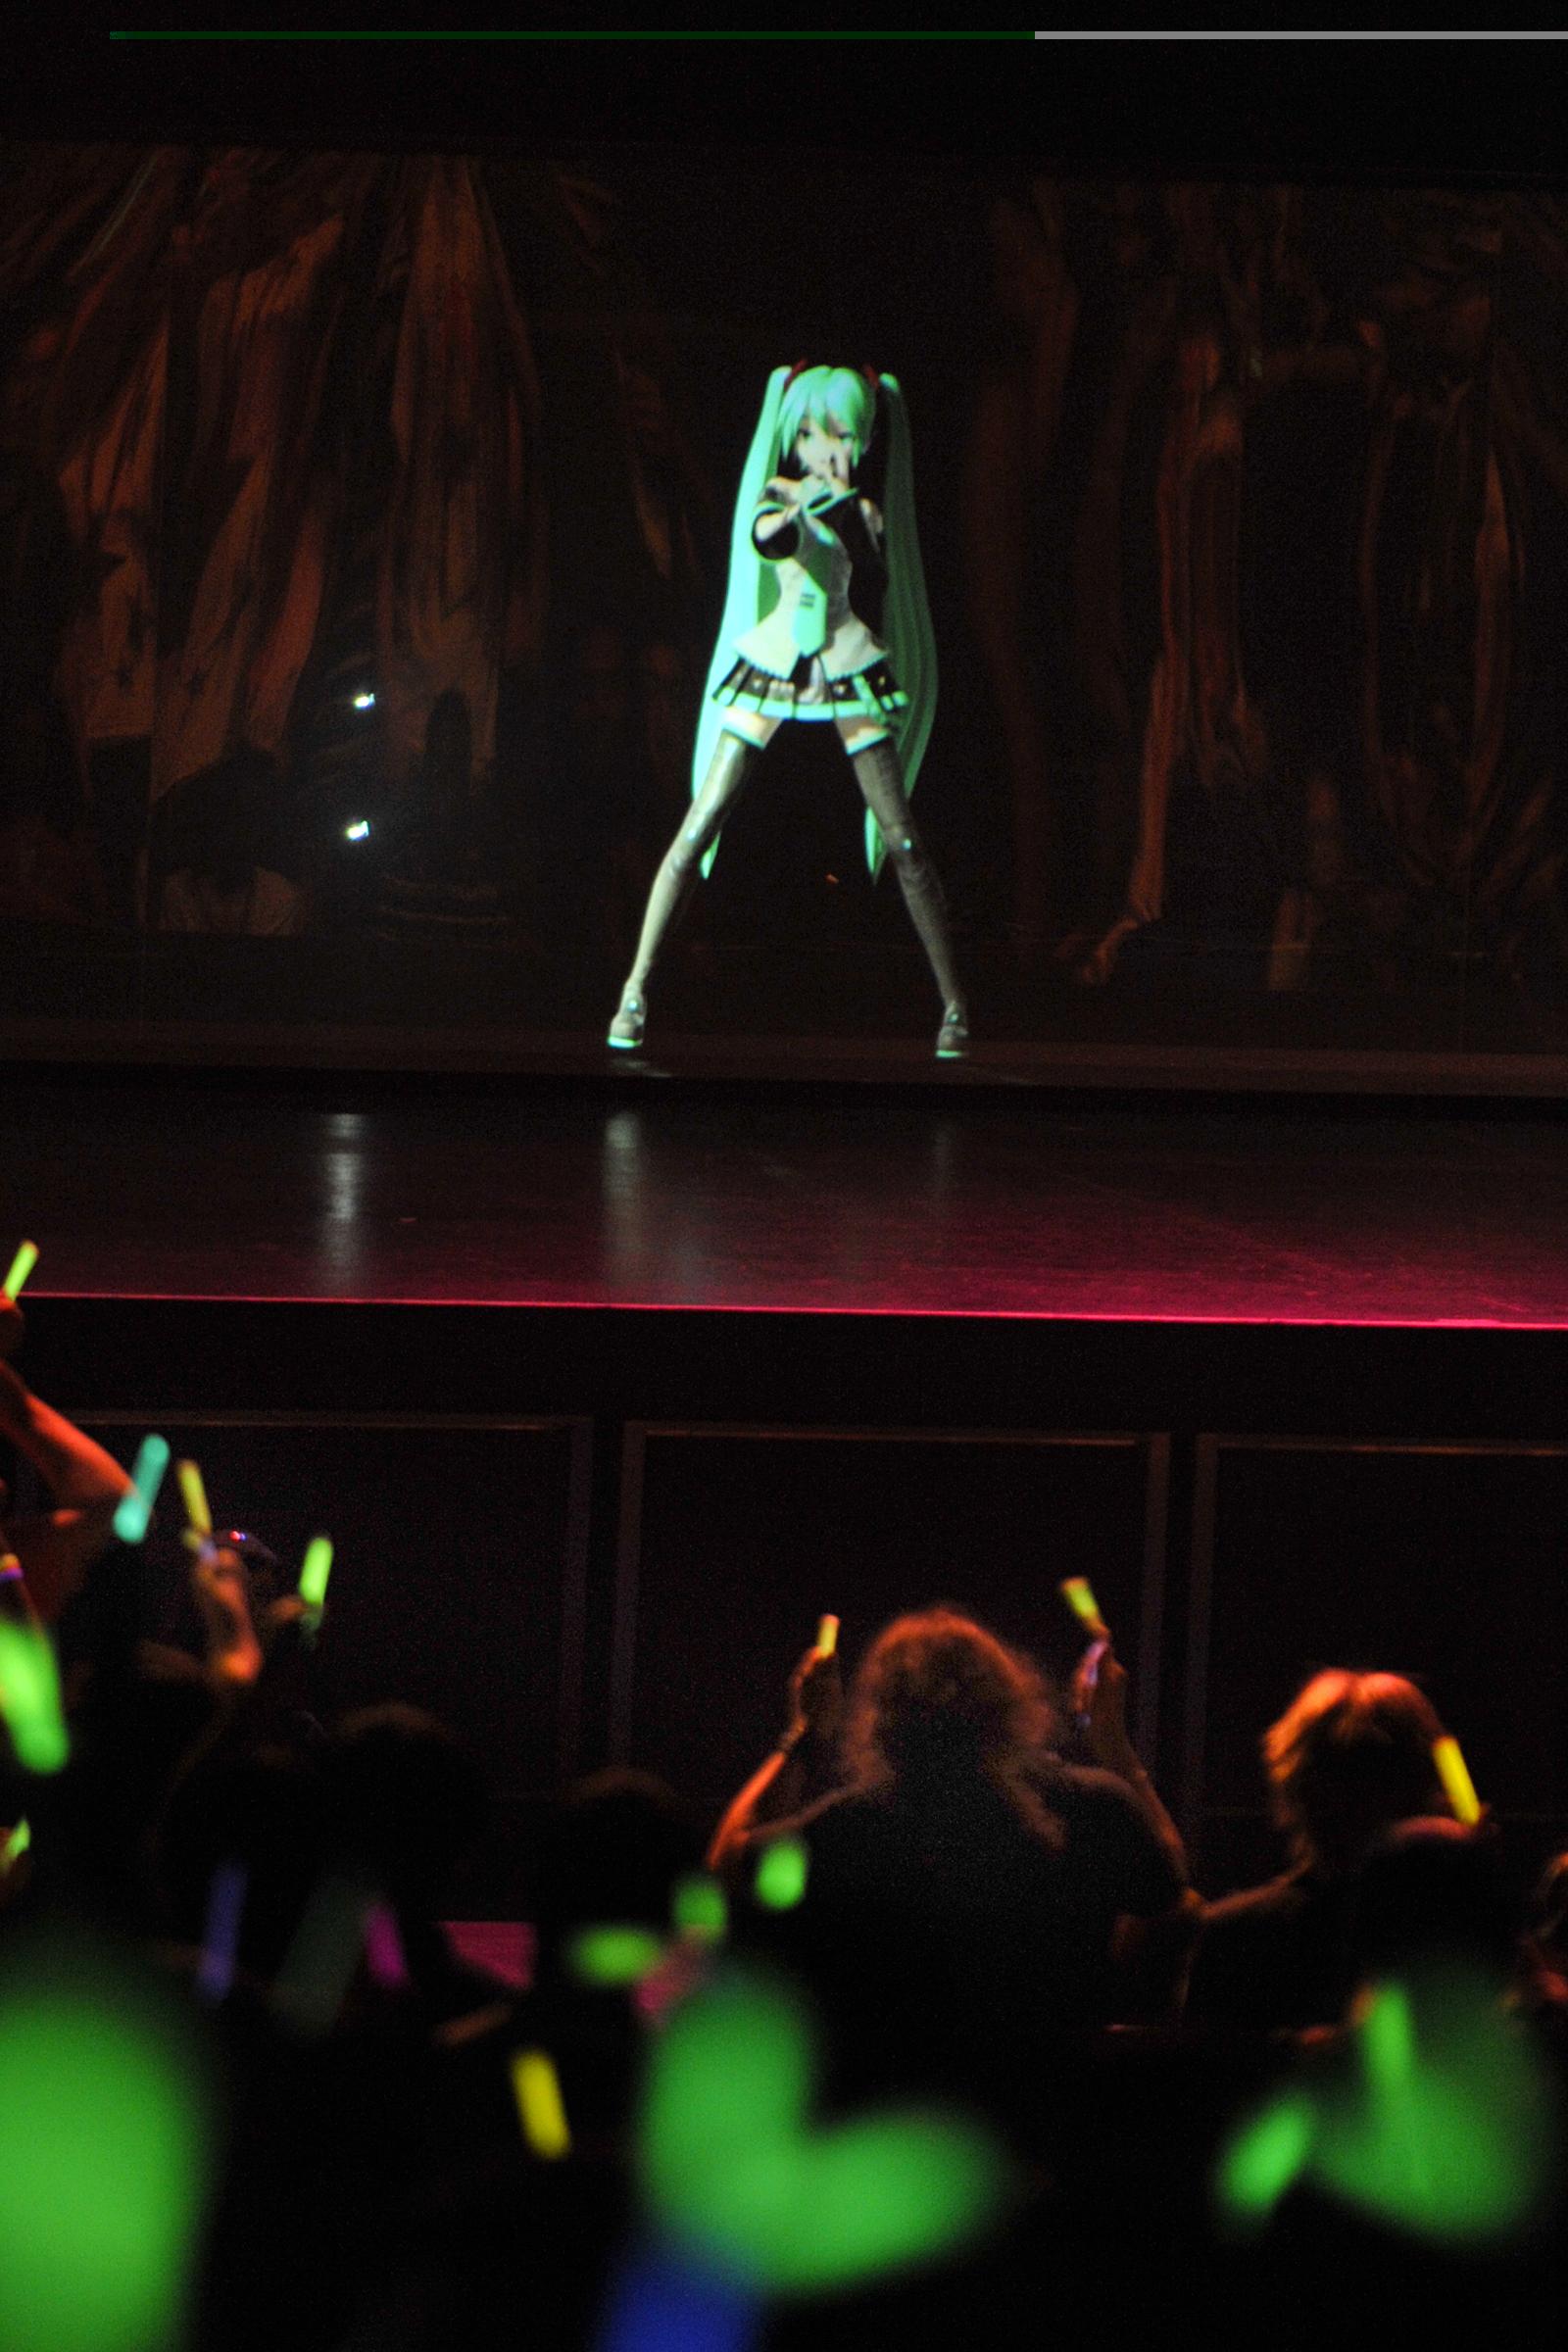 AFA11: Hatsune Miku is going to ROCK!